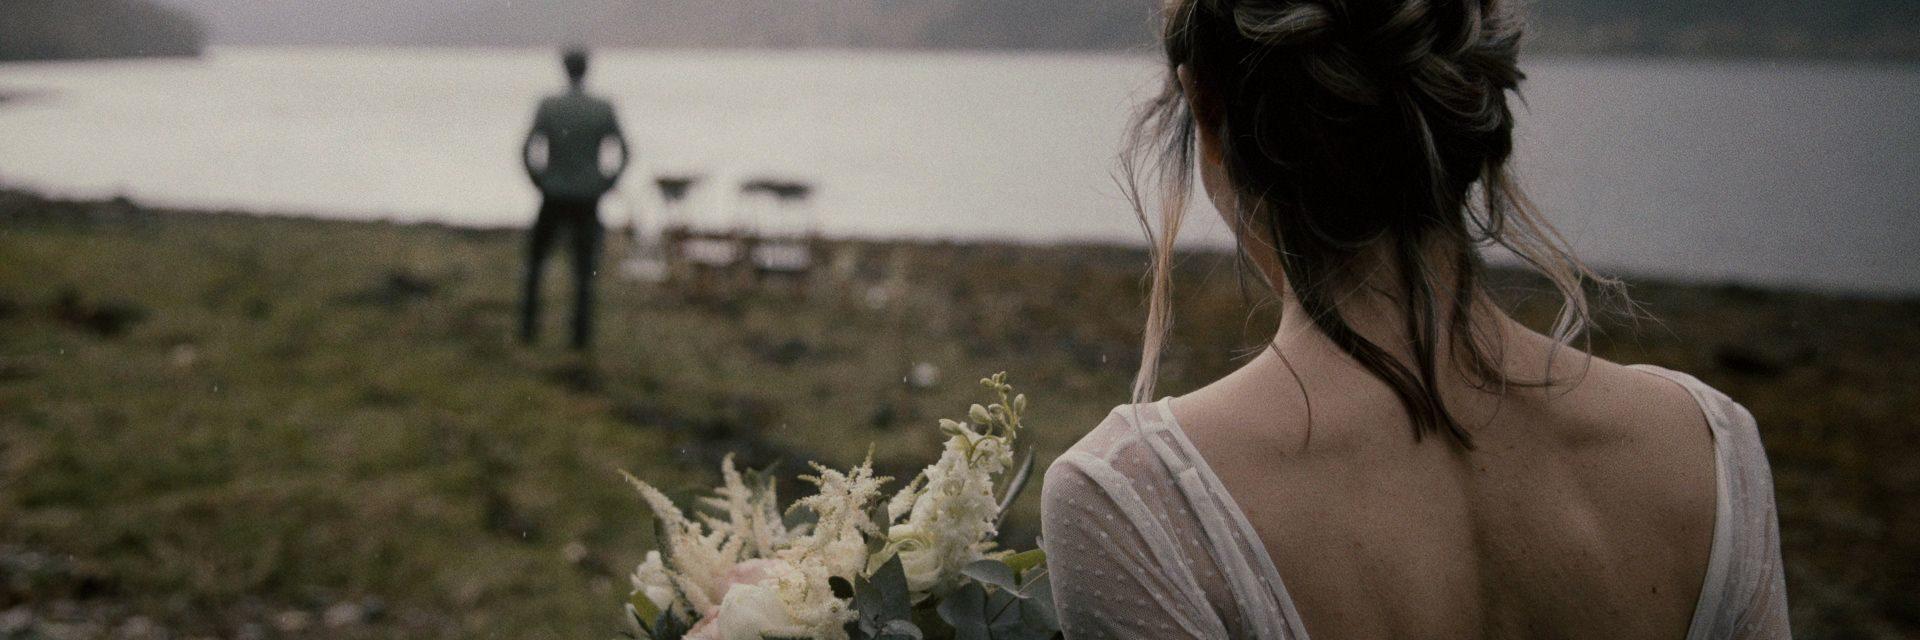 Sintra-wedding-videographer-cinemate-films-02